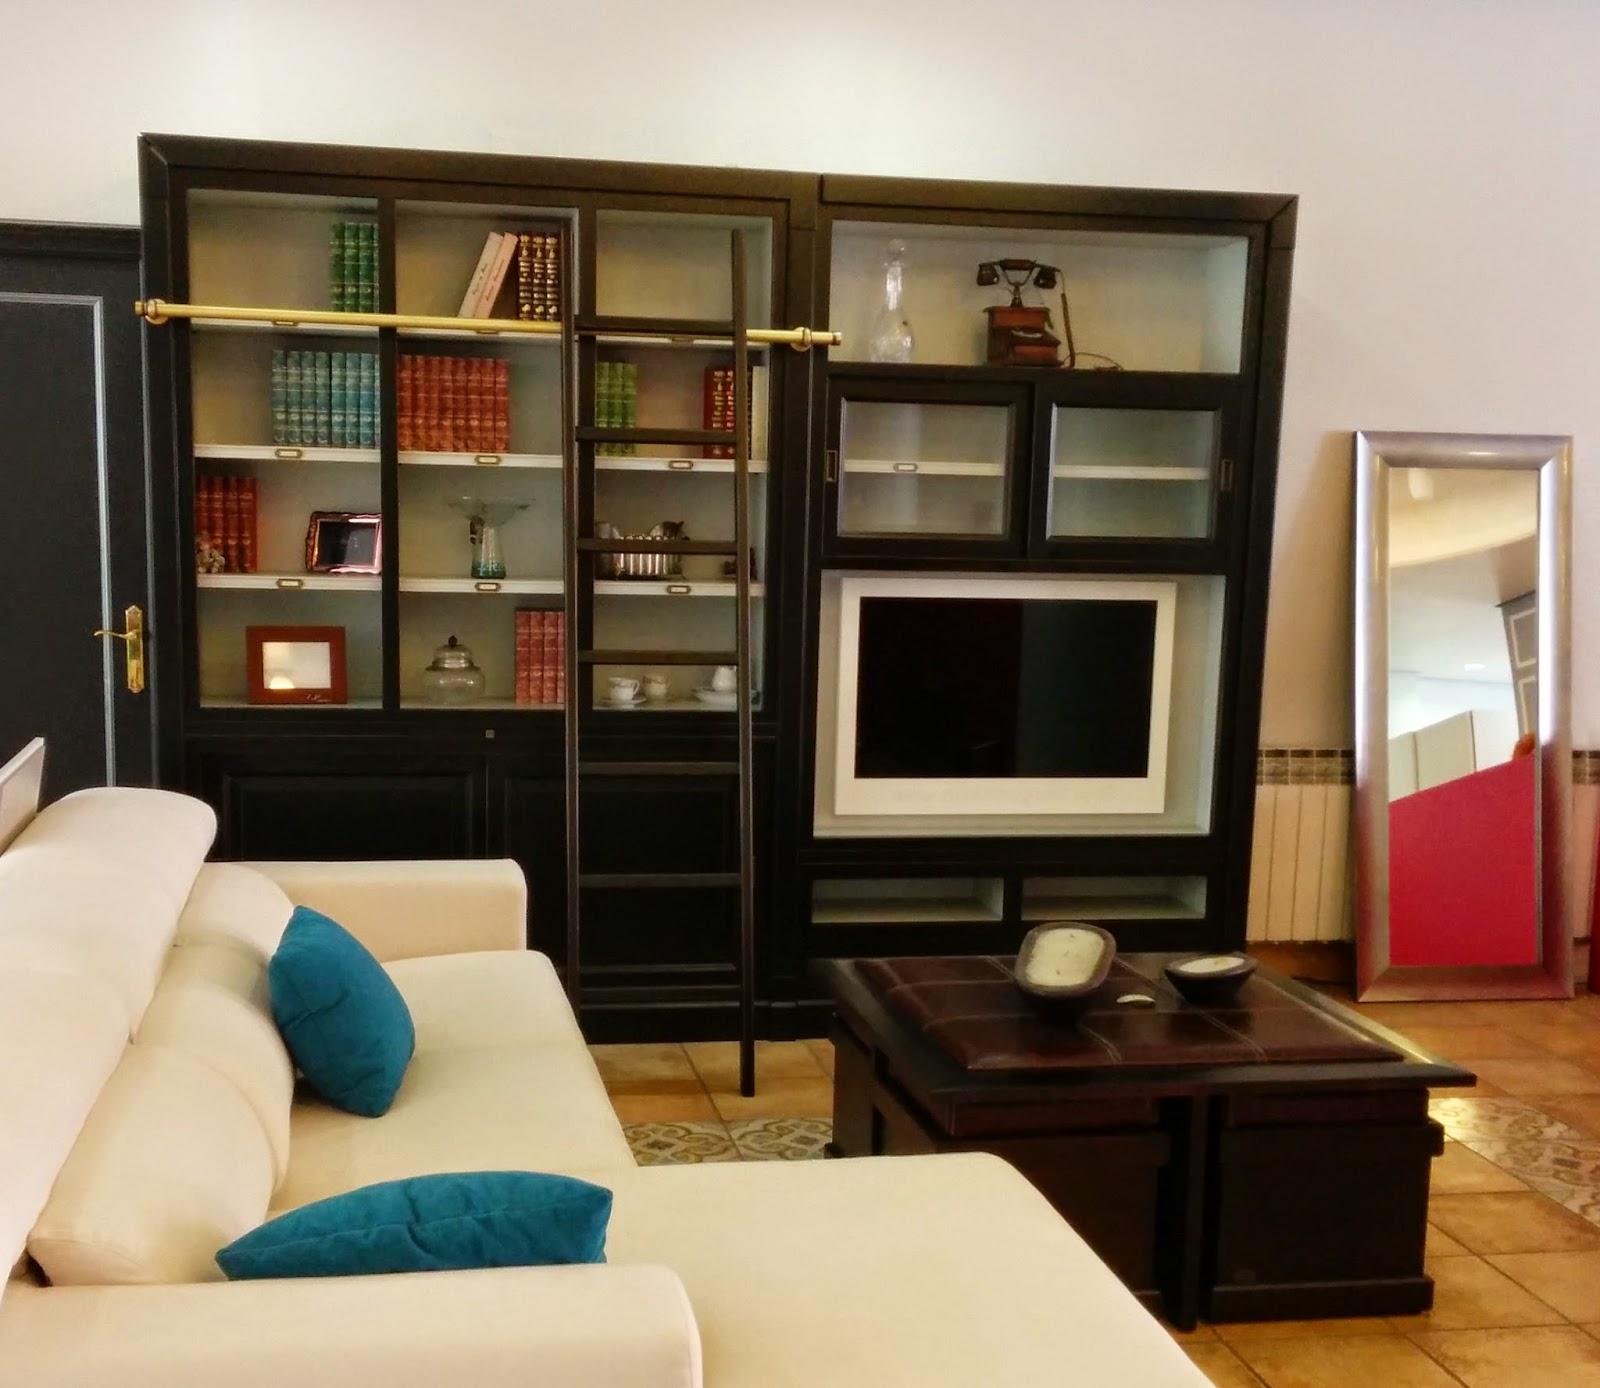 Muebles pozo decoraci n for Hipo muebles